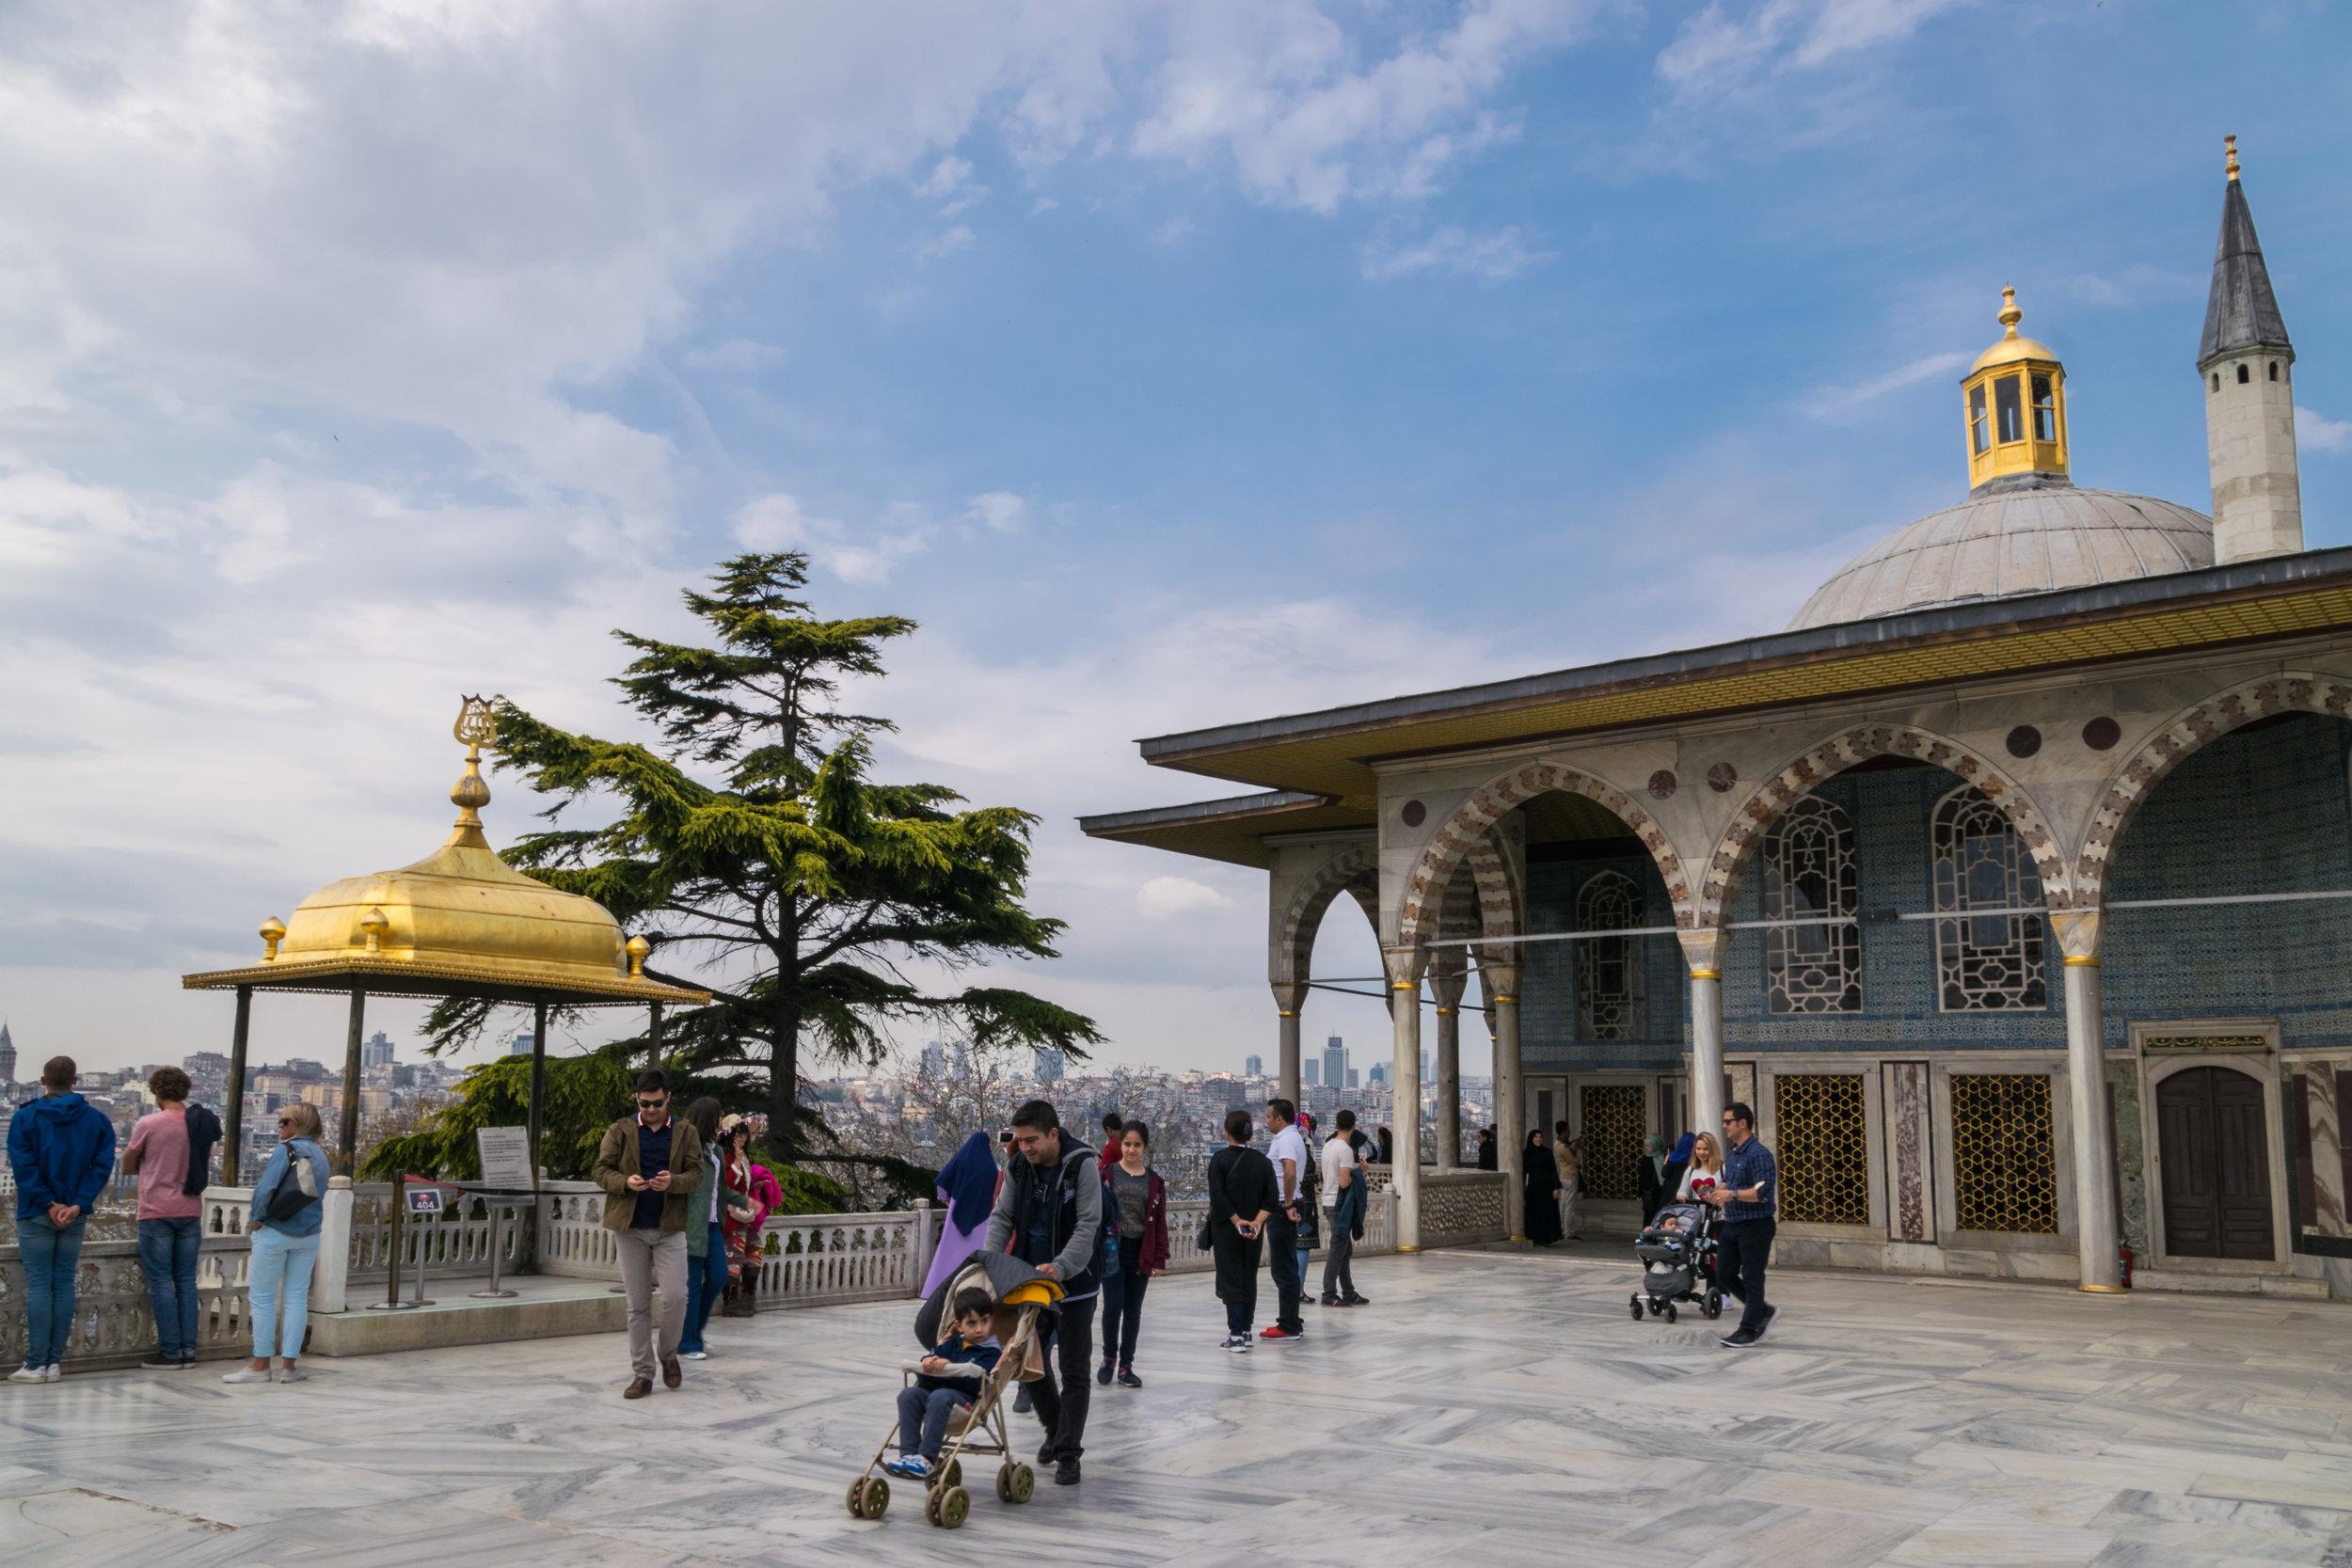 Turkey_Topkapi+Palace-1.jpg